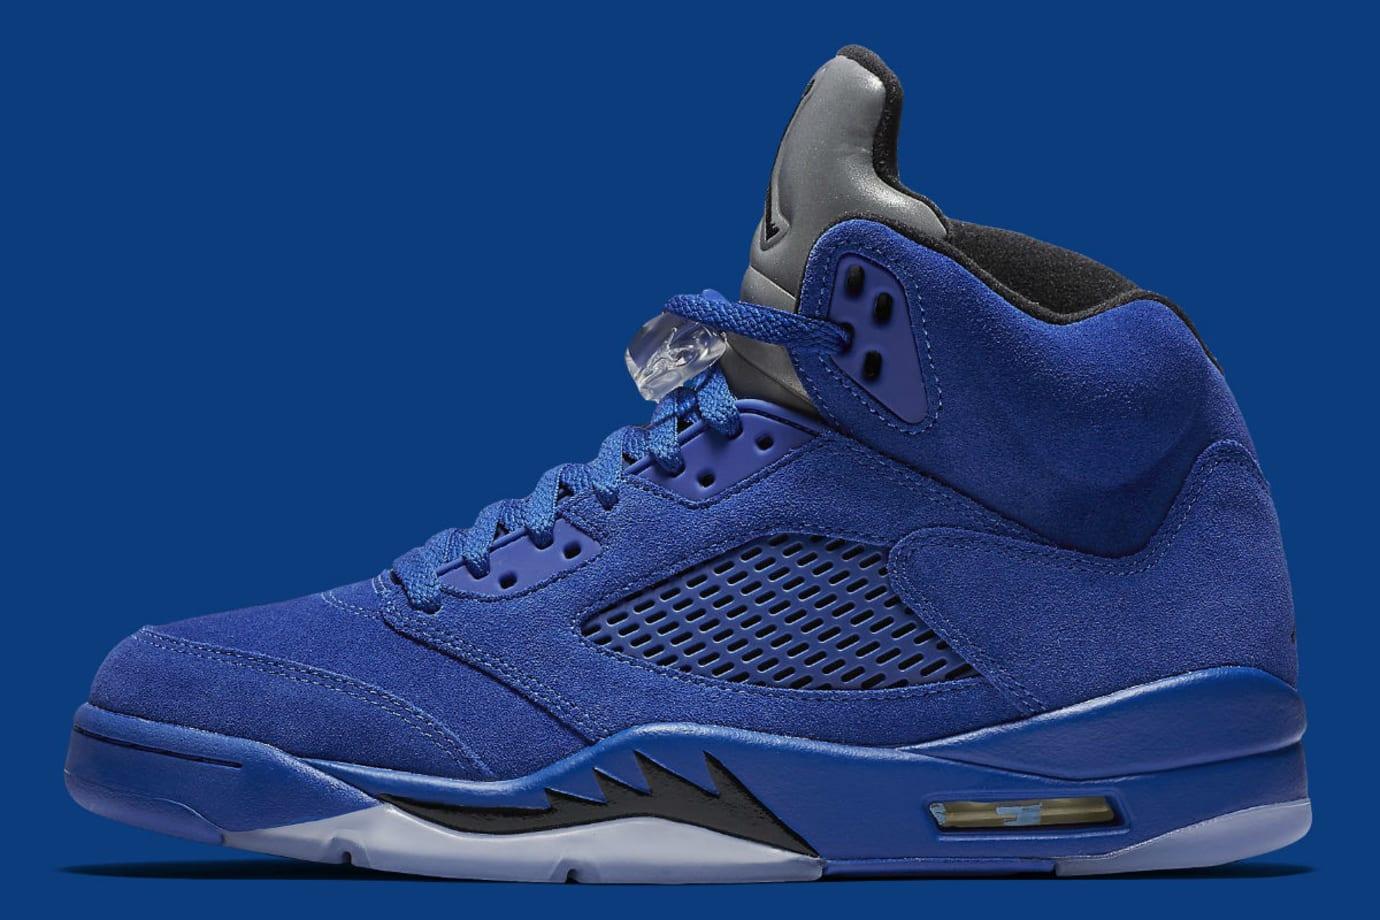 9d46b7b7cf3f66 Air Jordan 5 Royal Blue Suede Flight Suit Release Date Profile 136027-401